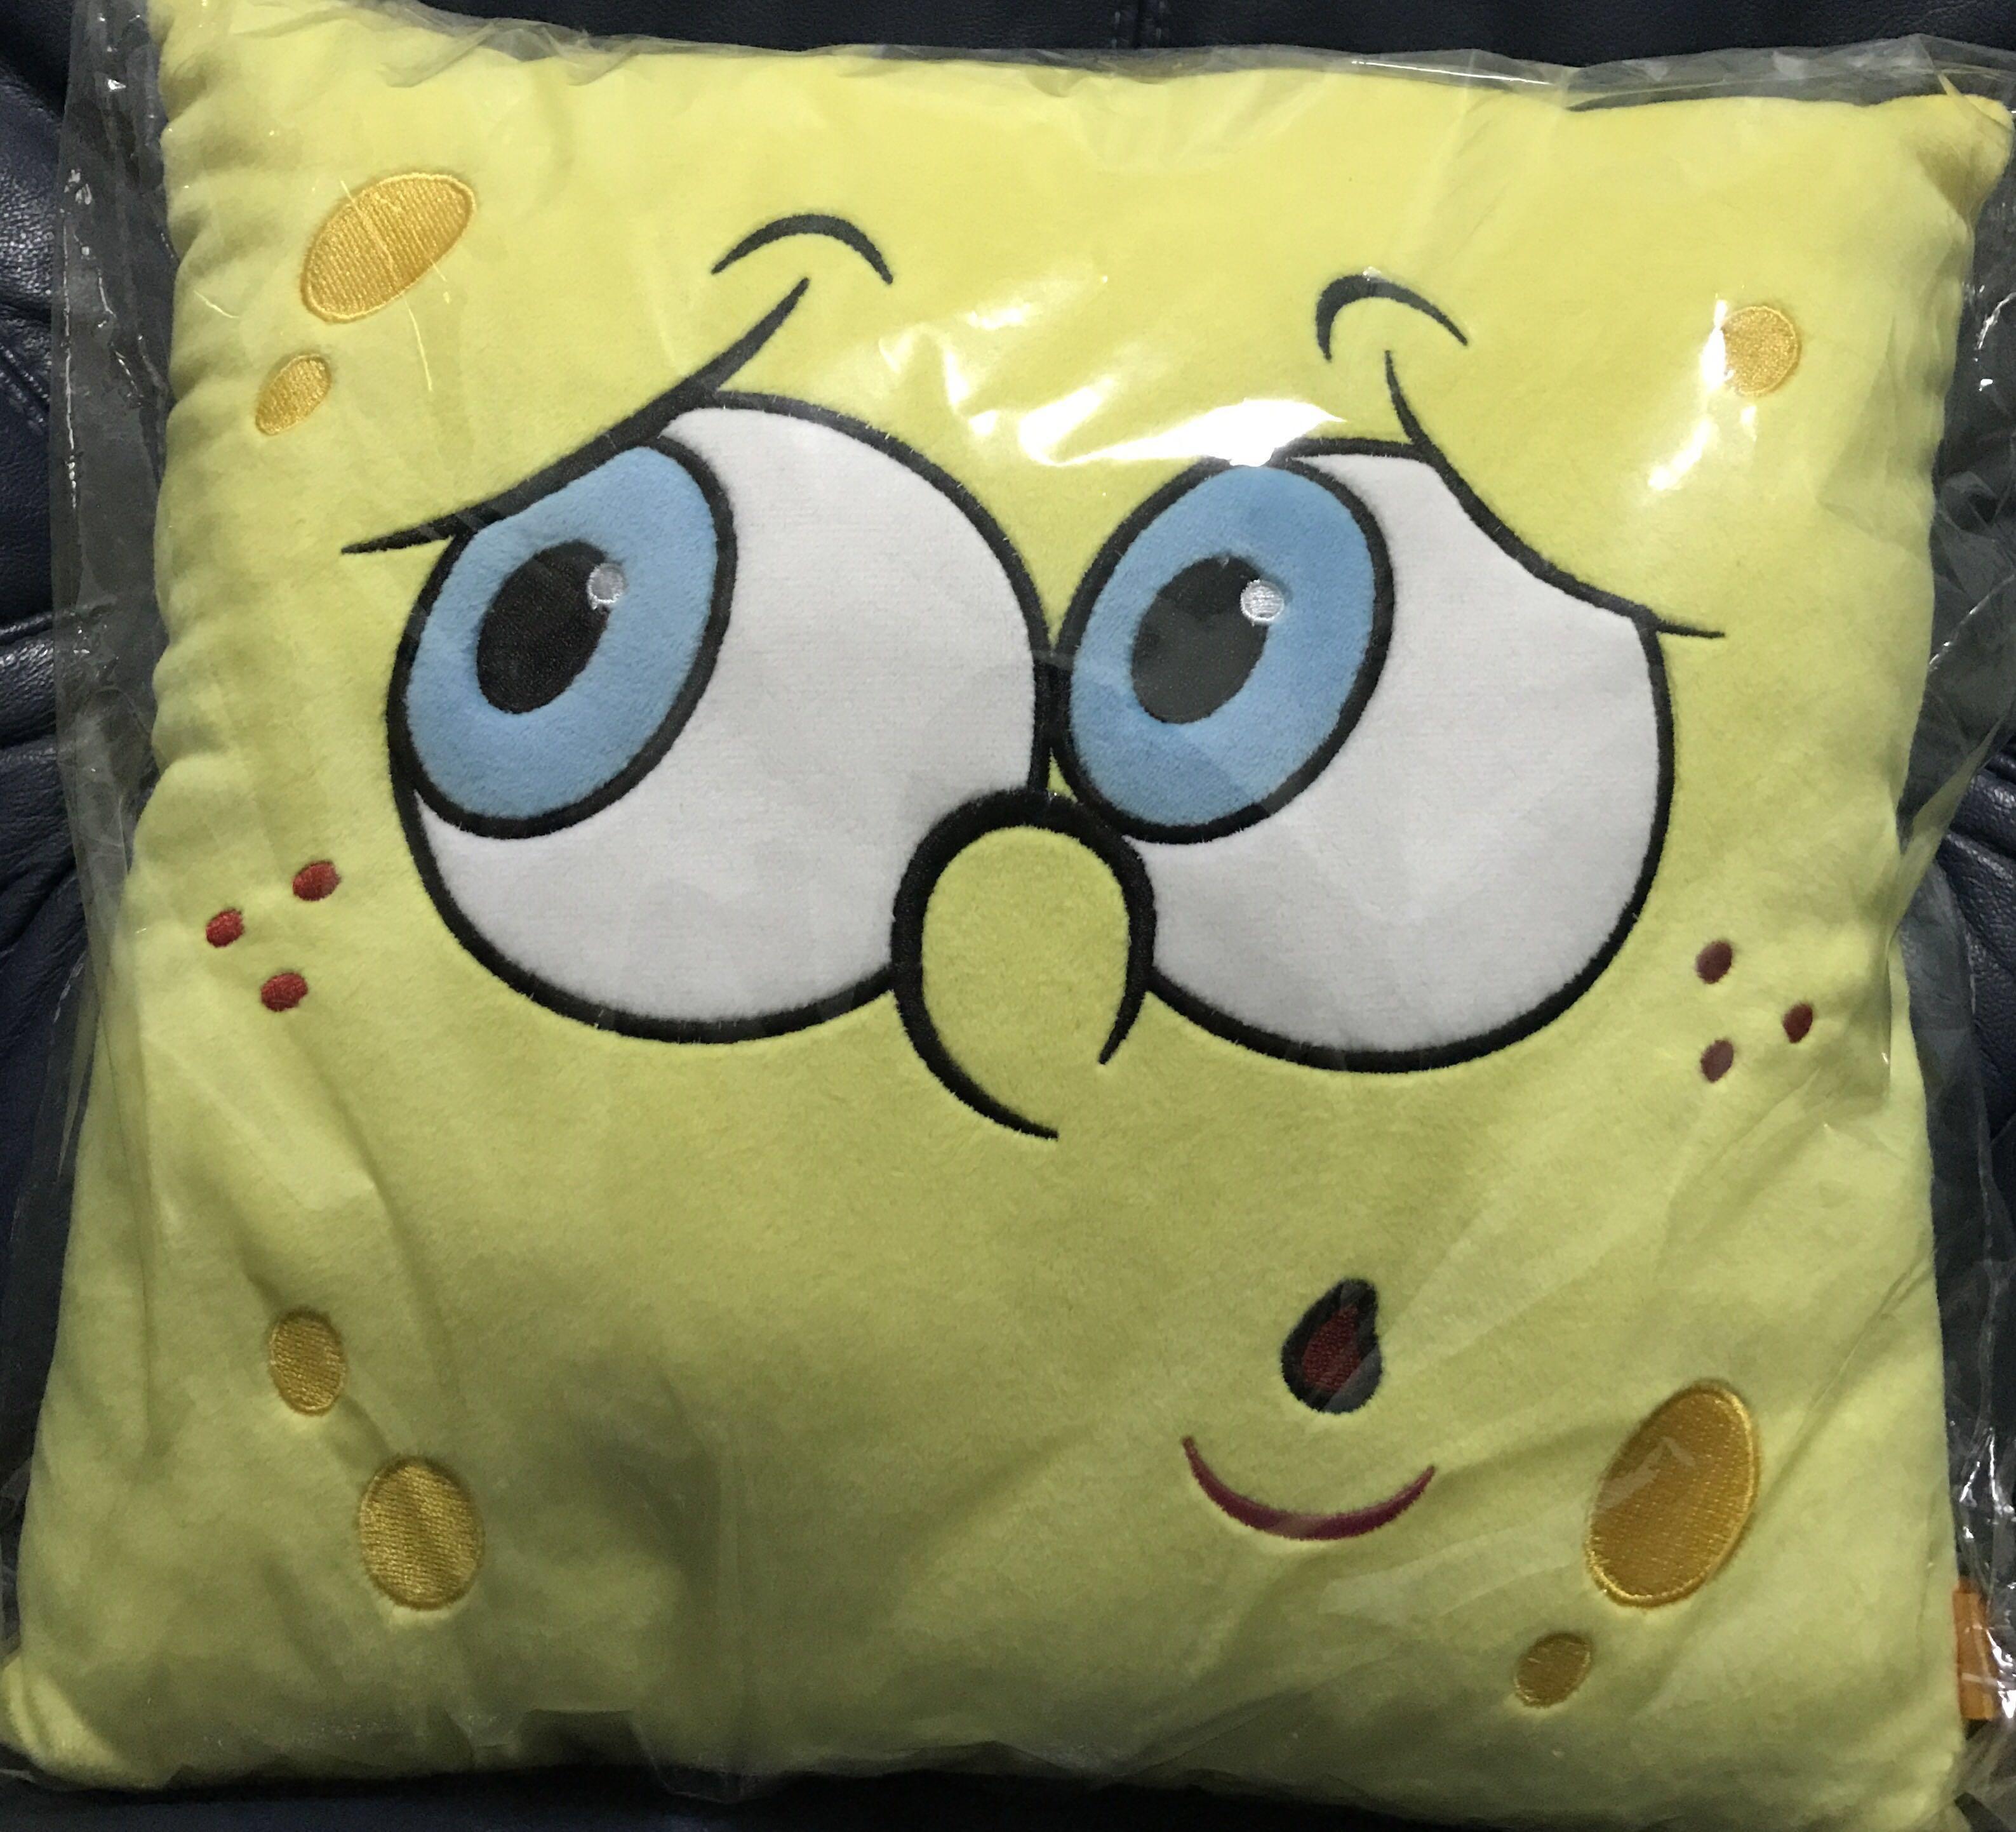 13 spongebob squarepants pillow home furniture home décor on